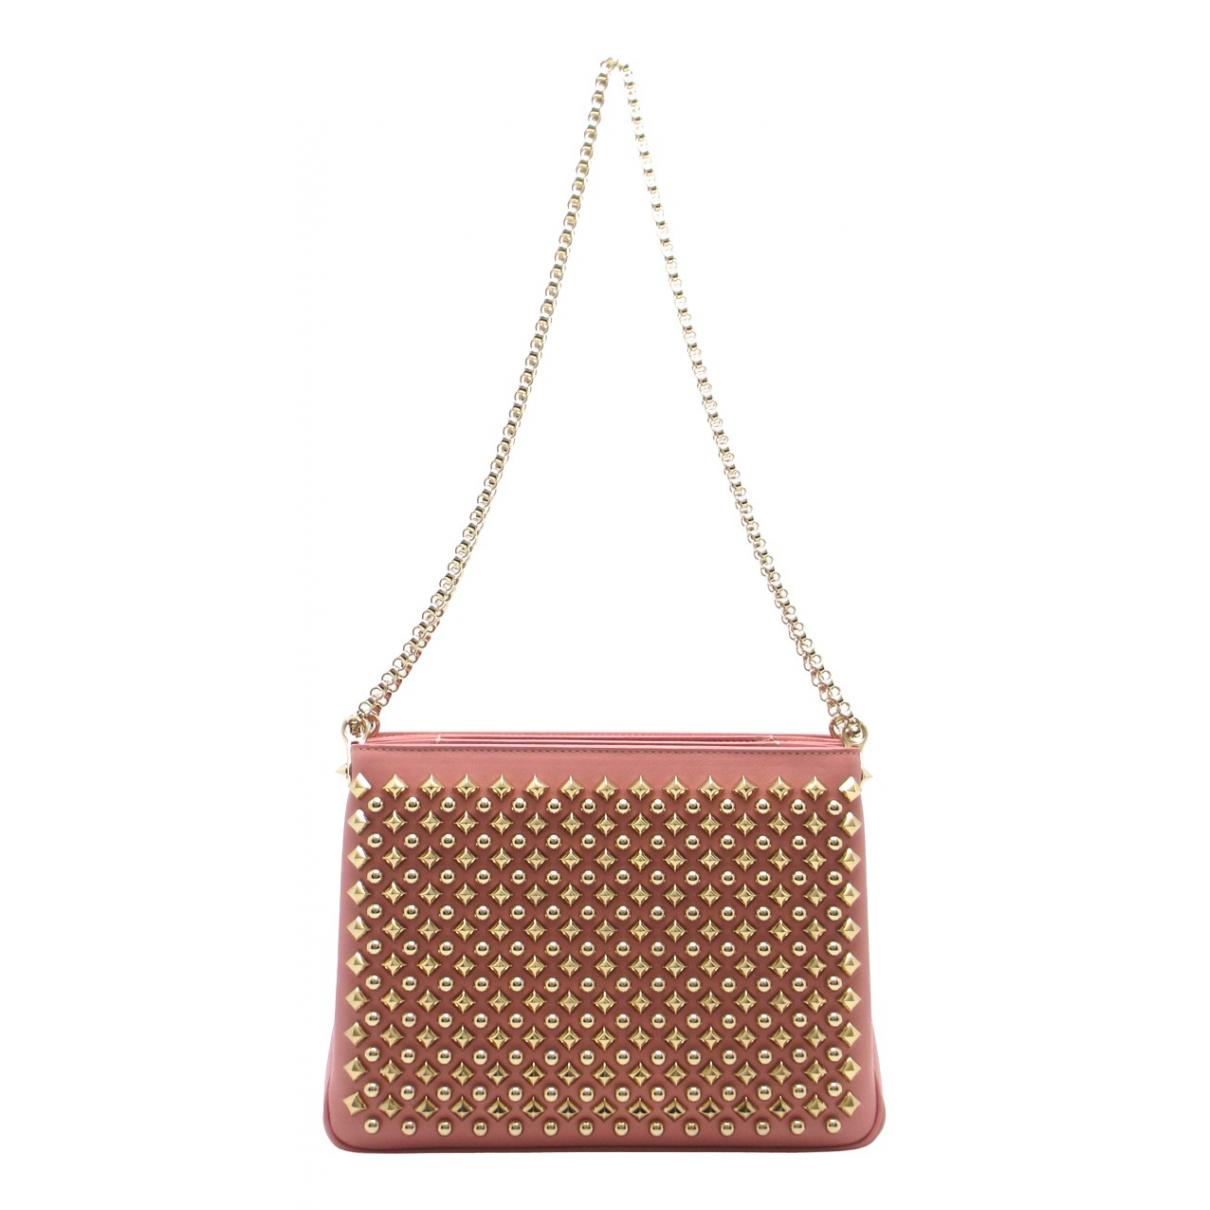 Christian Louboutin Triloubi Pink Leather handbag for Women N